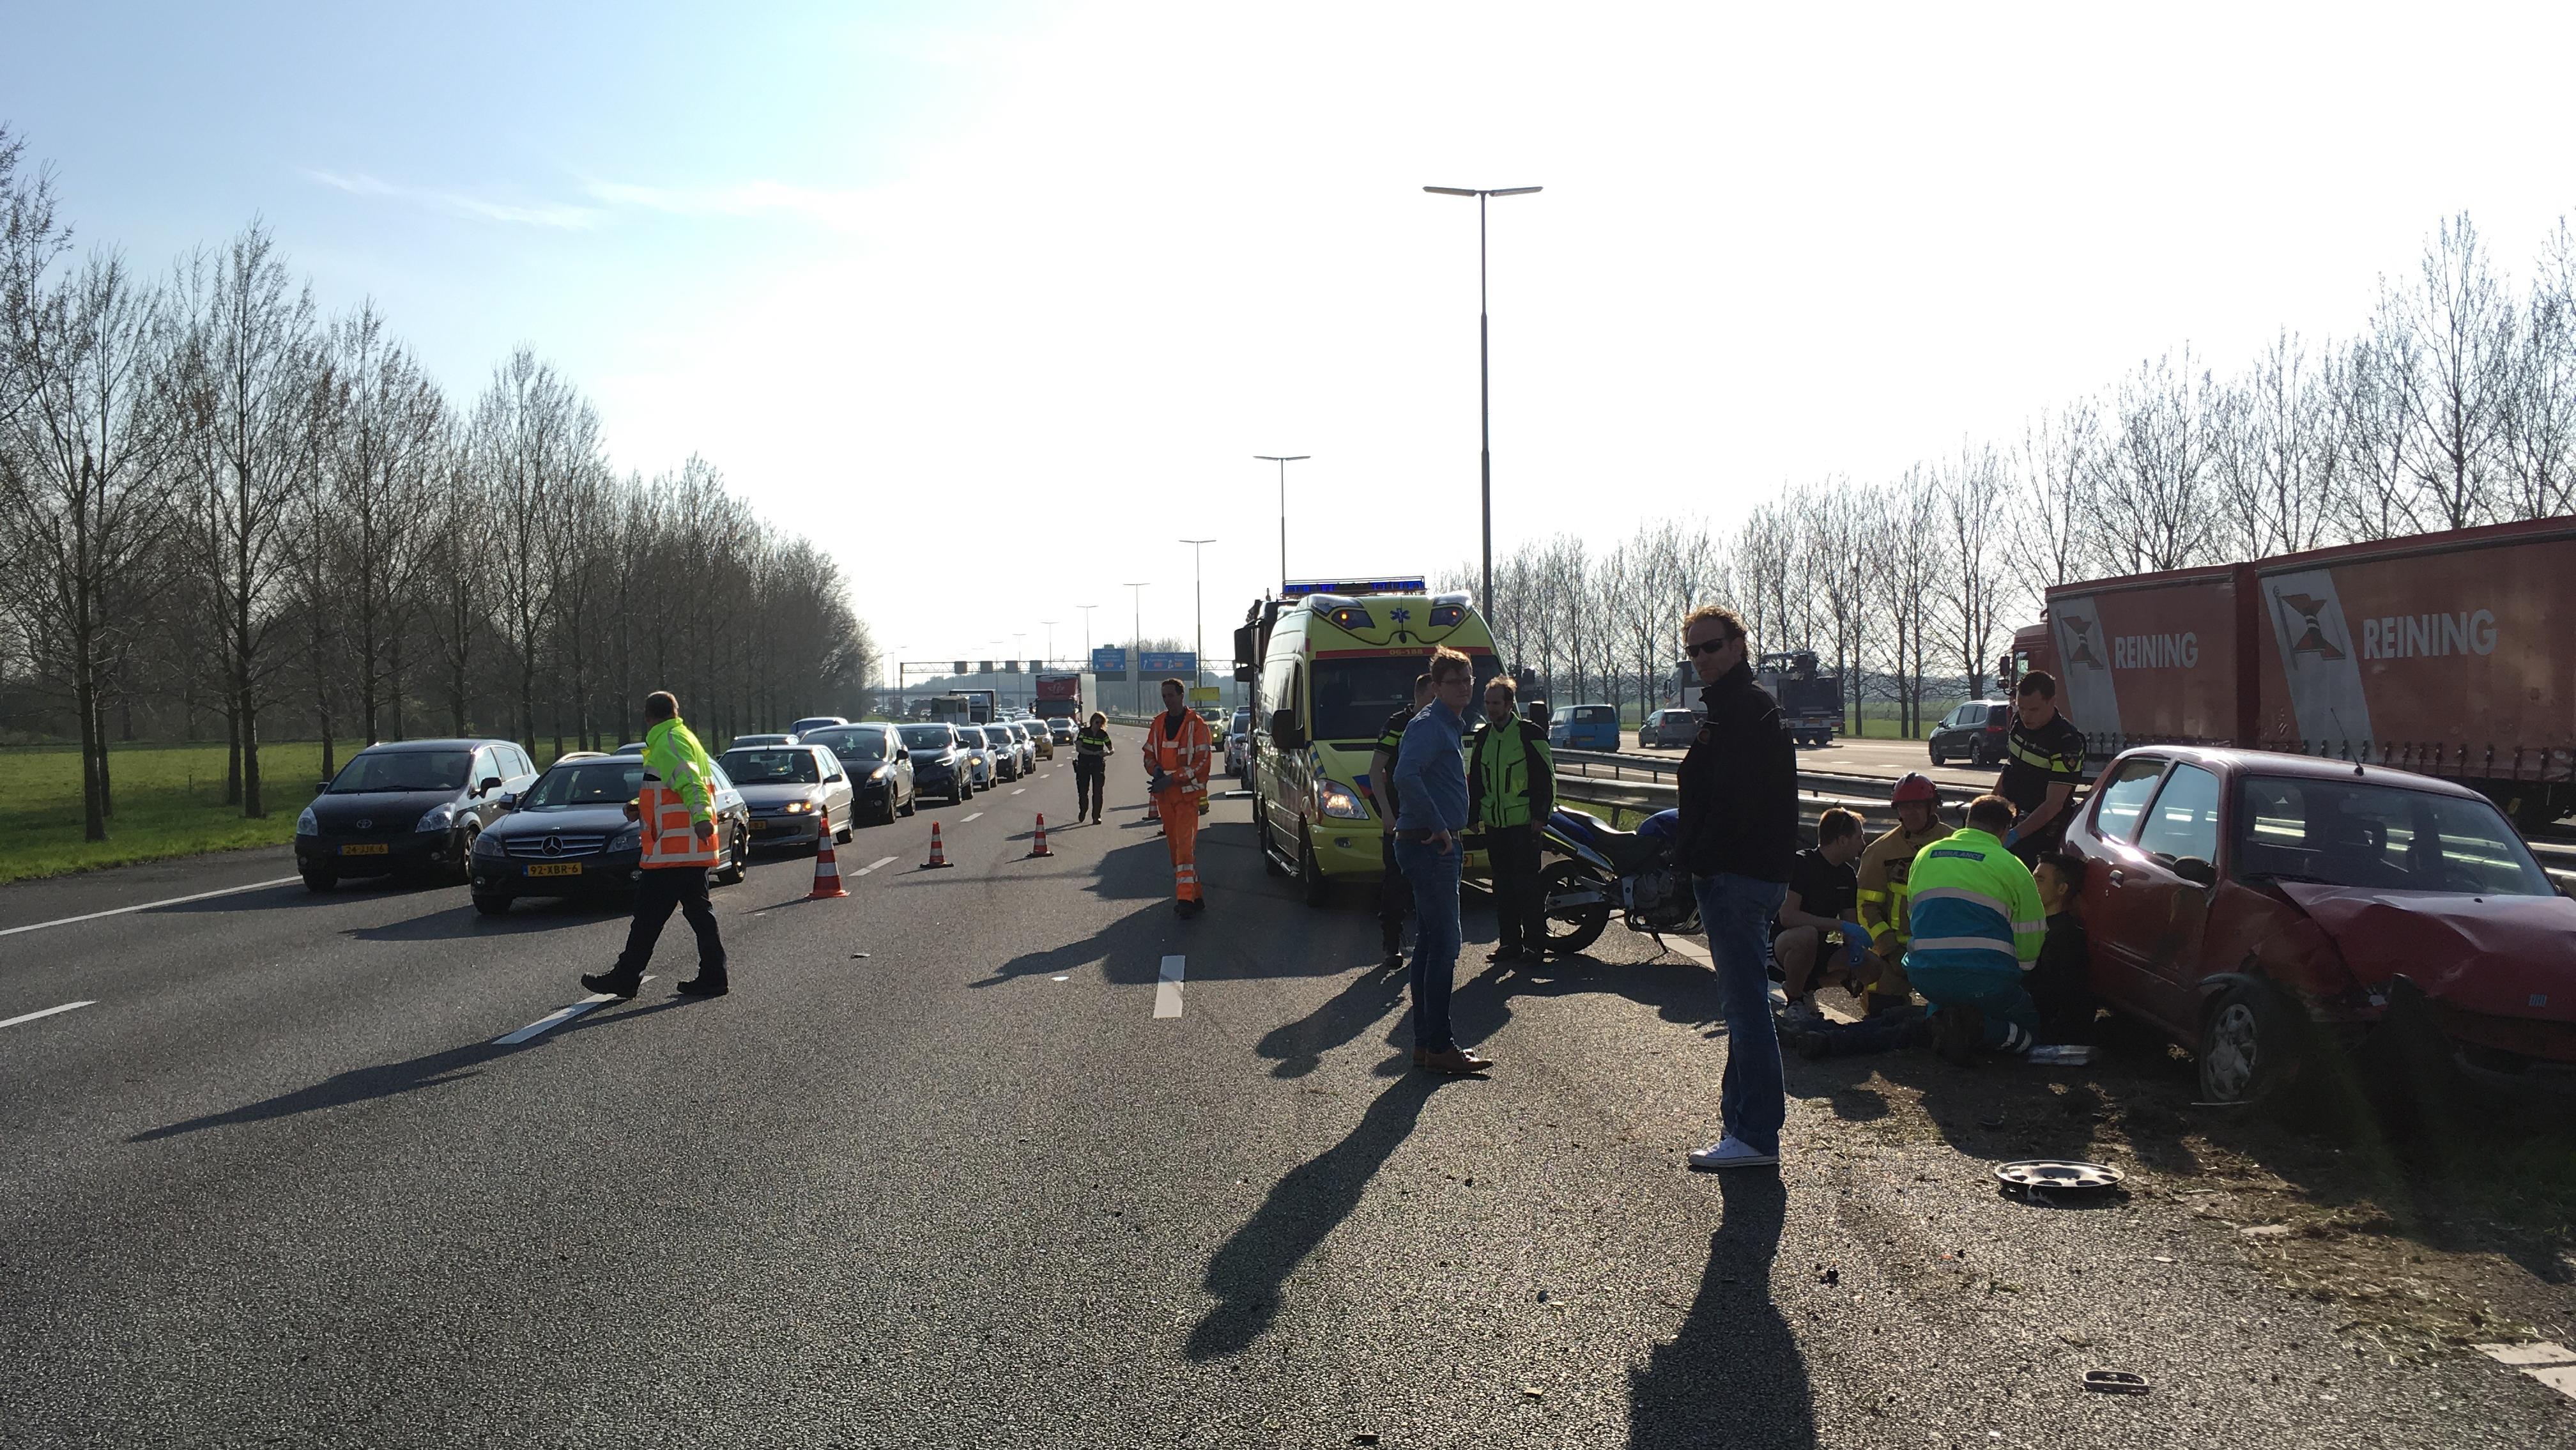 Ongeluk op A28 richting Zwolle; file van acht kilometer ...